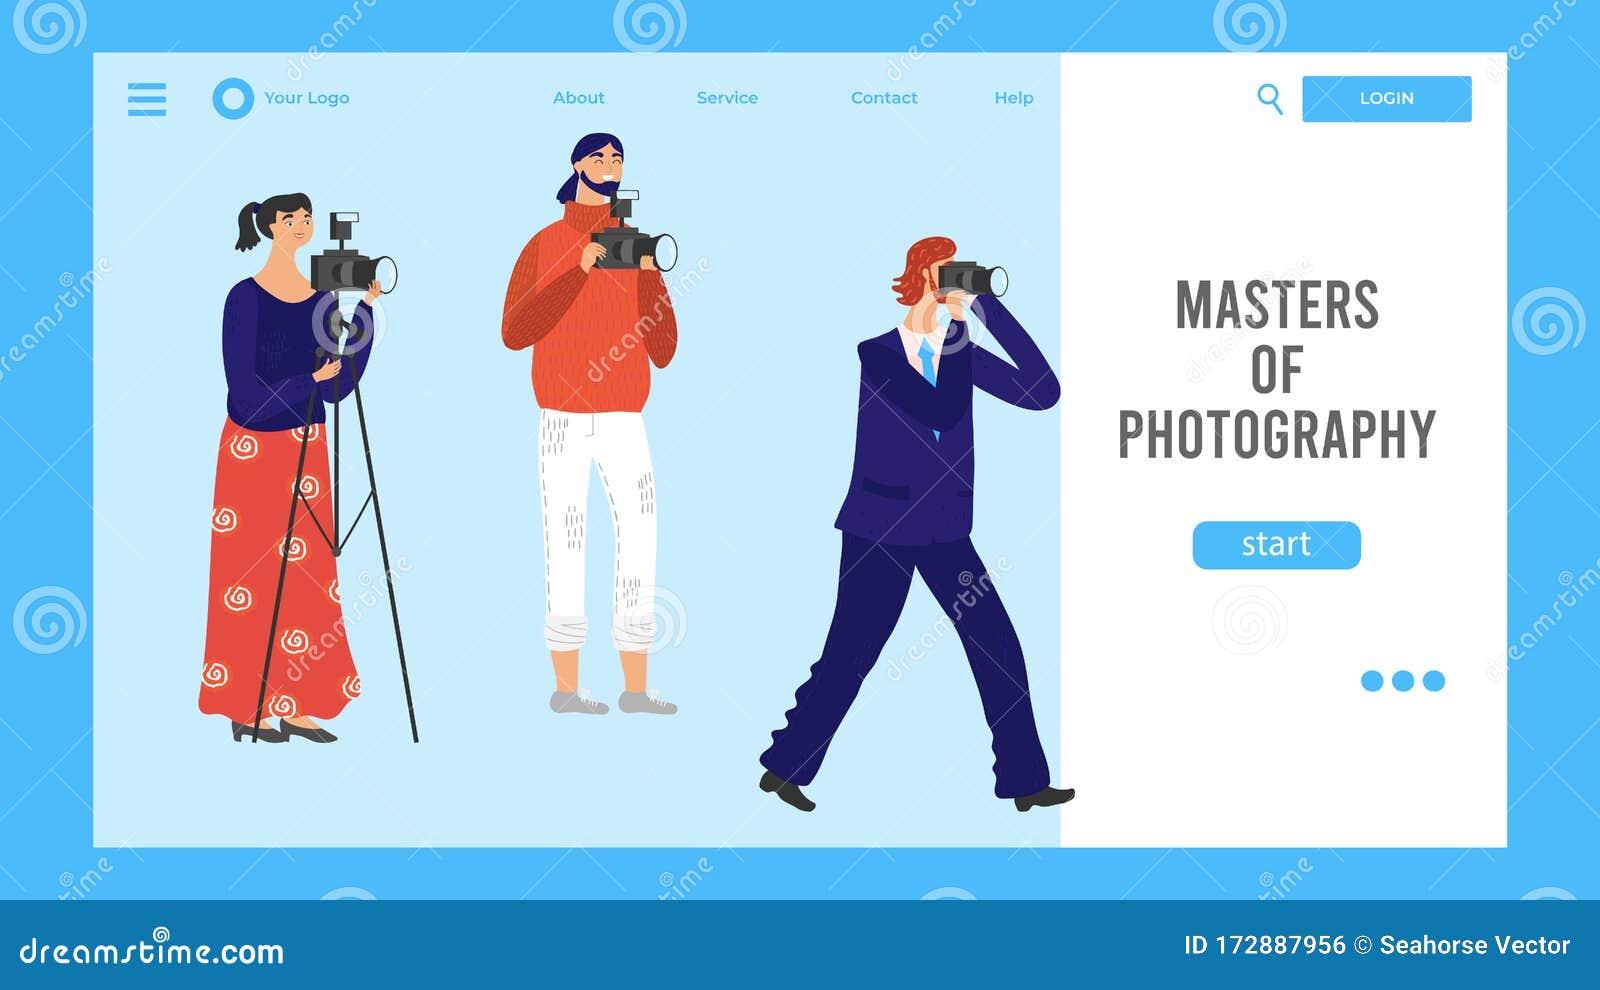 Photography School Website Design Advanced Level Course Vector Illustration Stock Vector Illustration Of Person Illustration 172887956